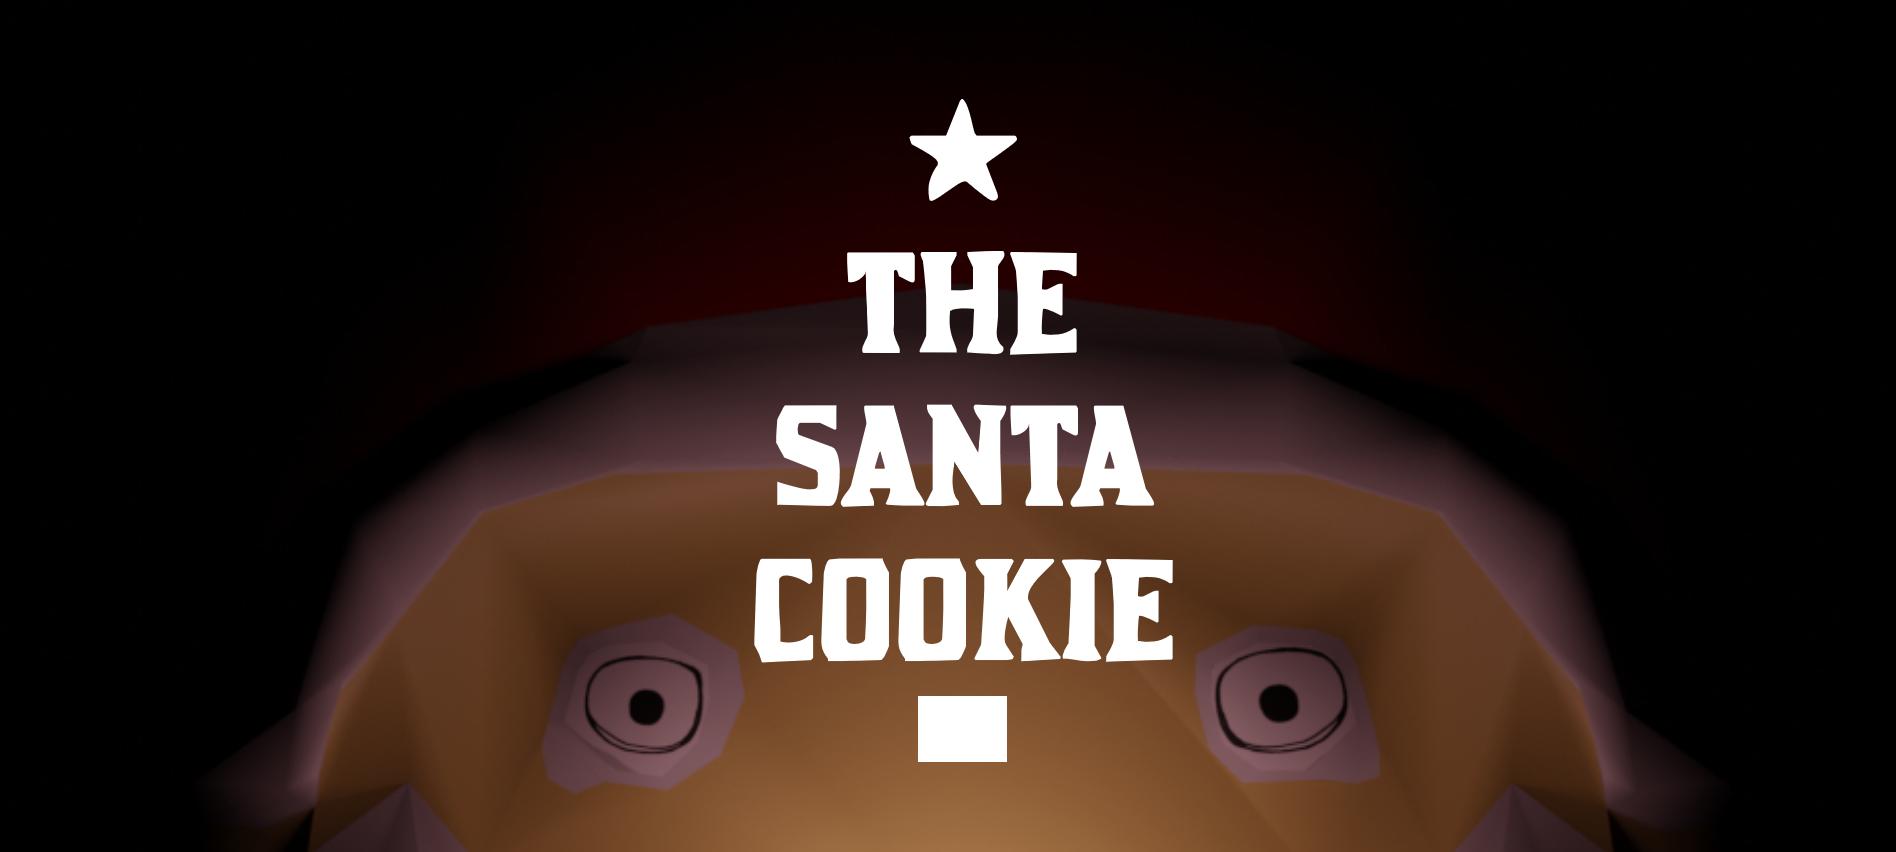 The Santa Cookie